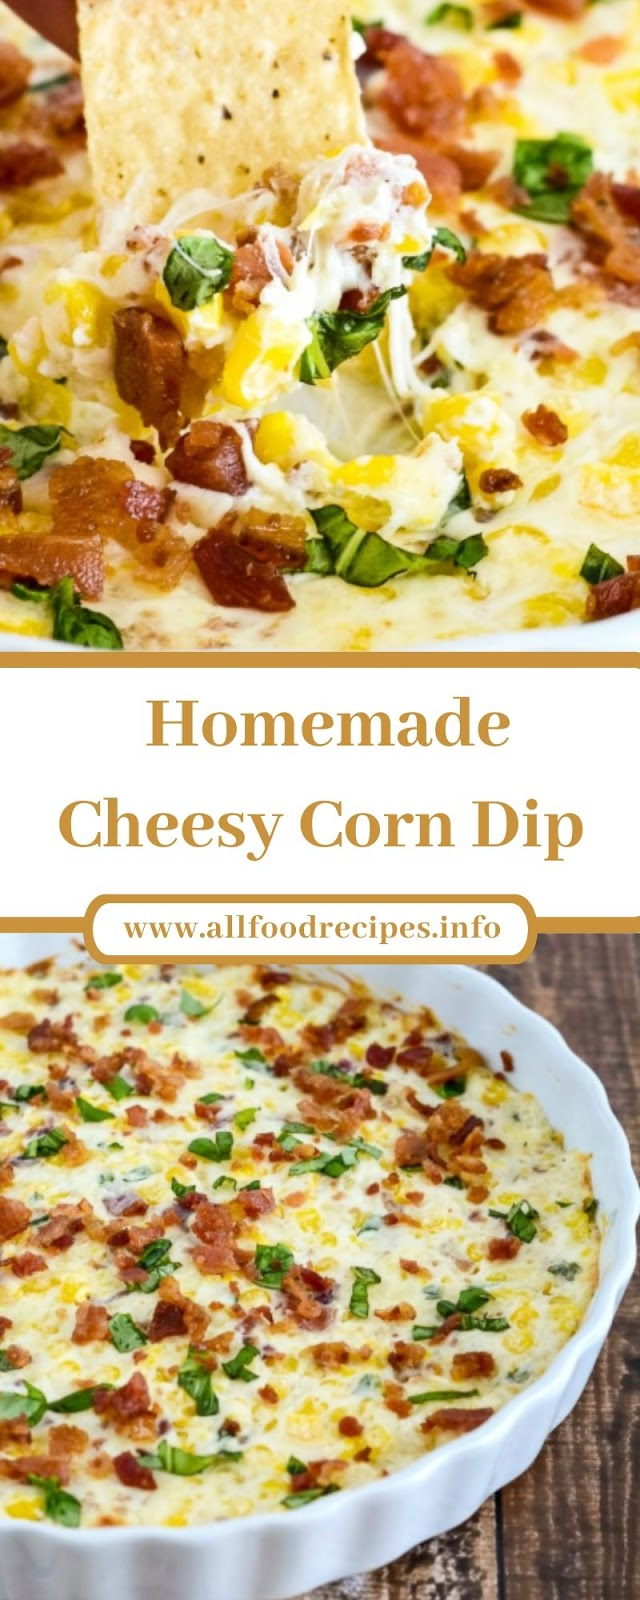 Homemade Cheesy Corn Dip